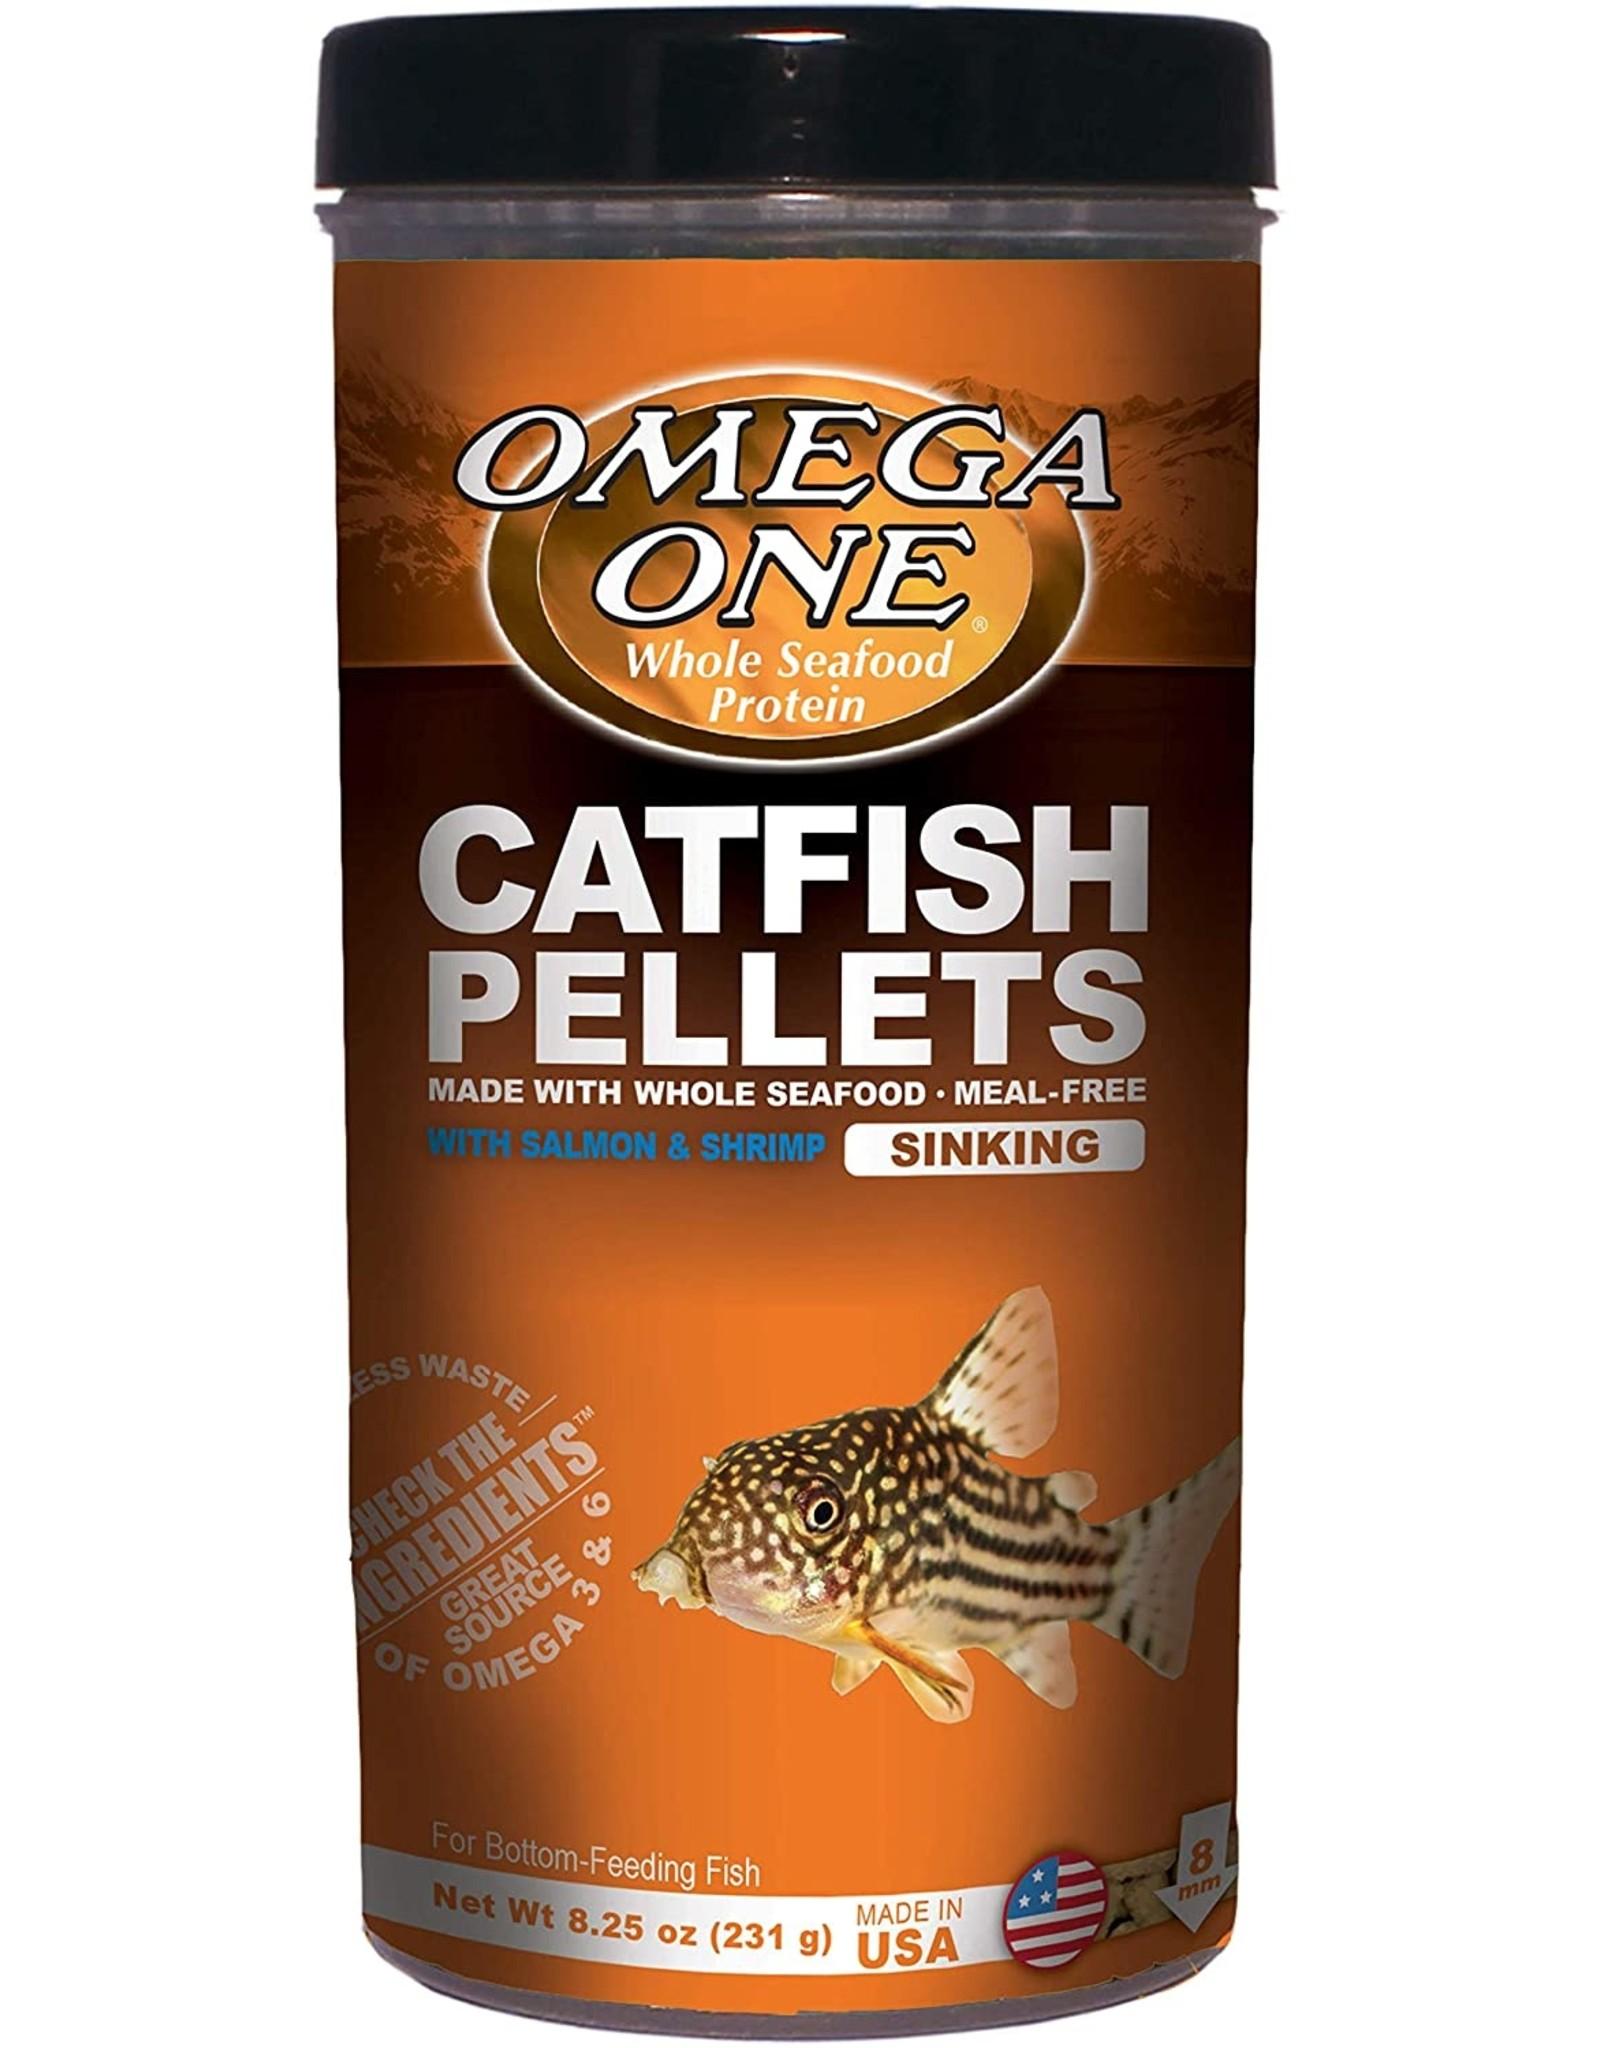 Omega One Food OMEGA ONE Catfish Pellets